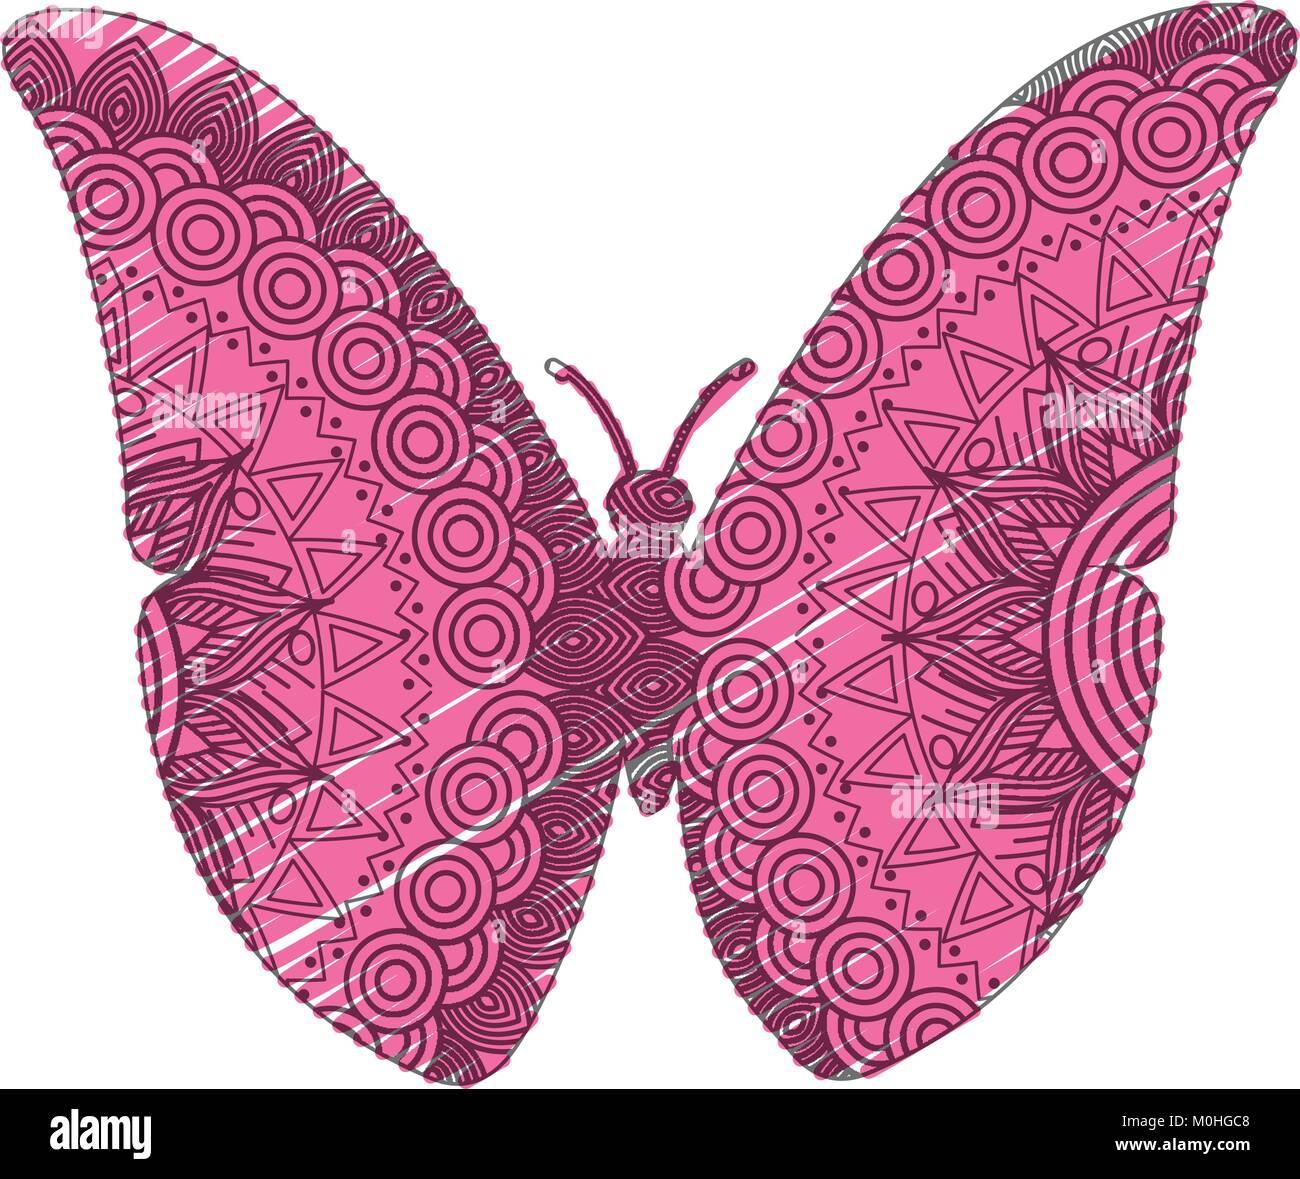 Atemberaubend Süße Schmetterlinge Malvorlagen Fotos - Druckbare ...